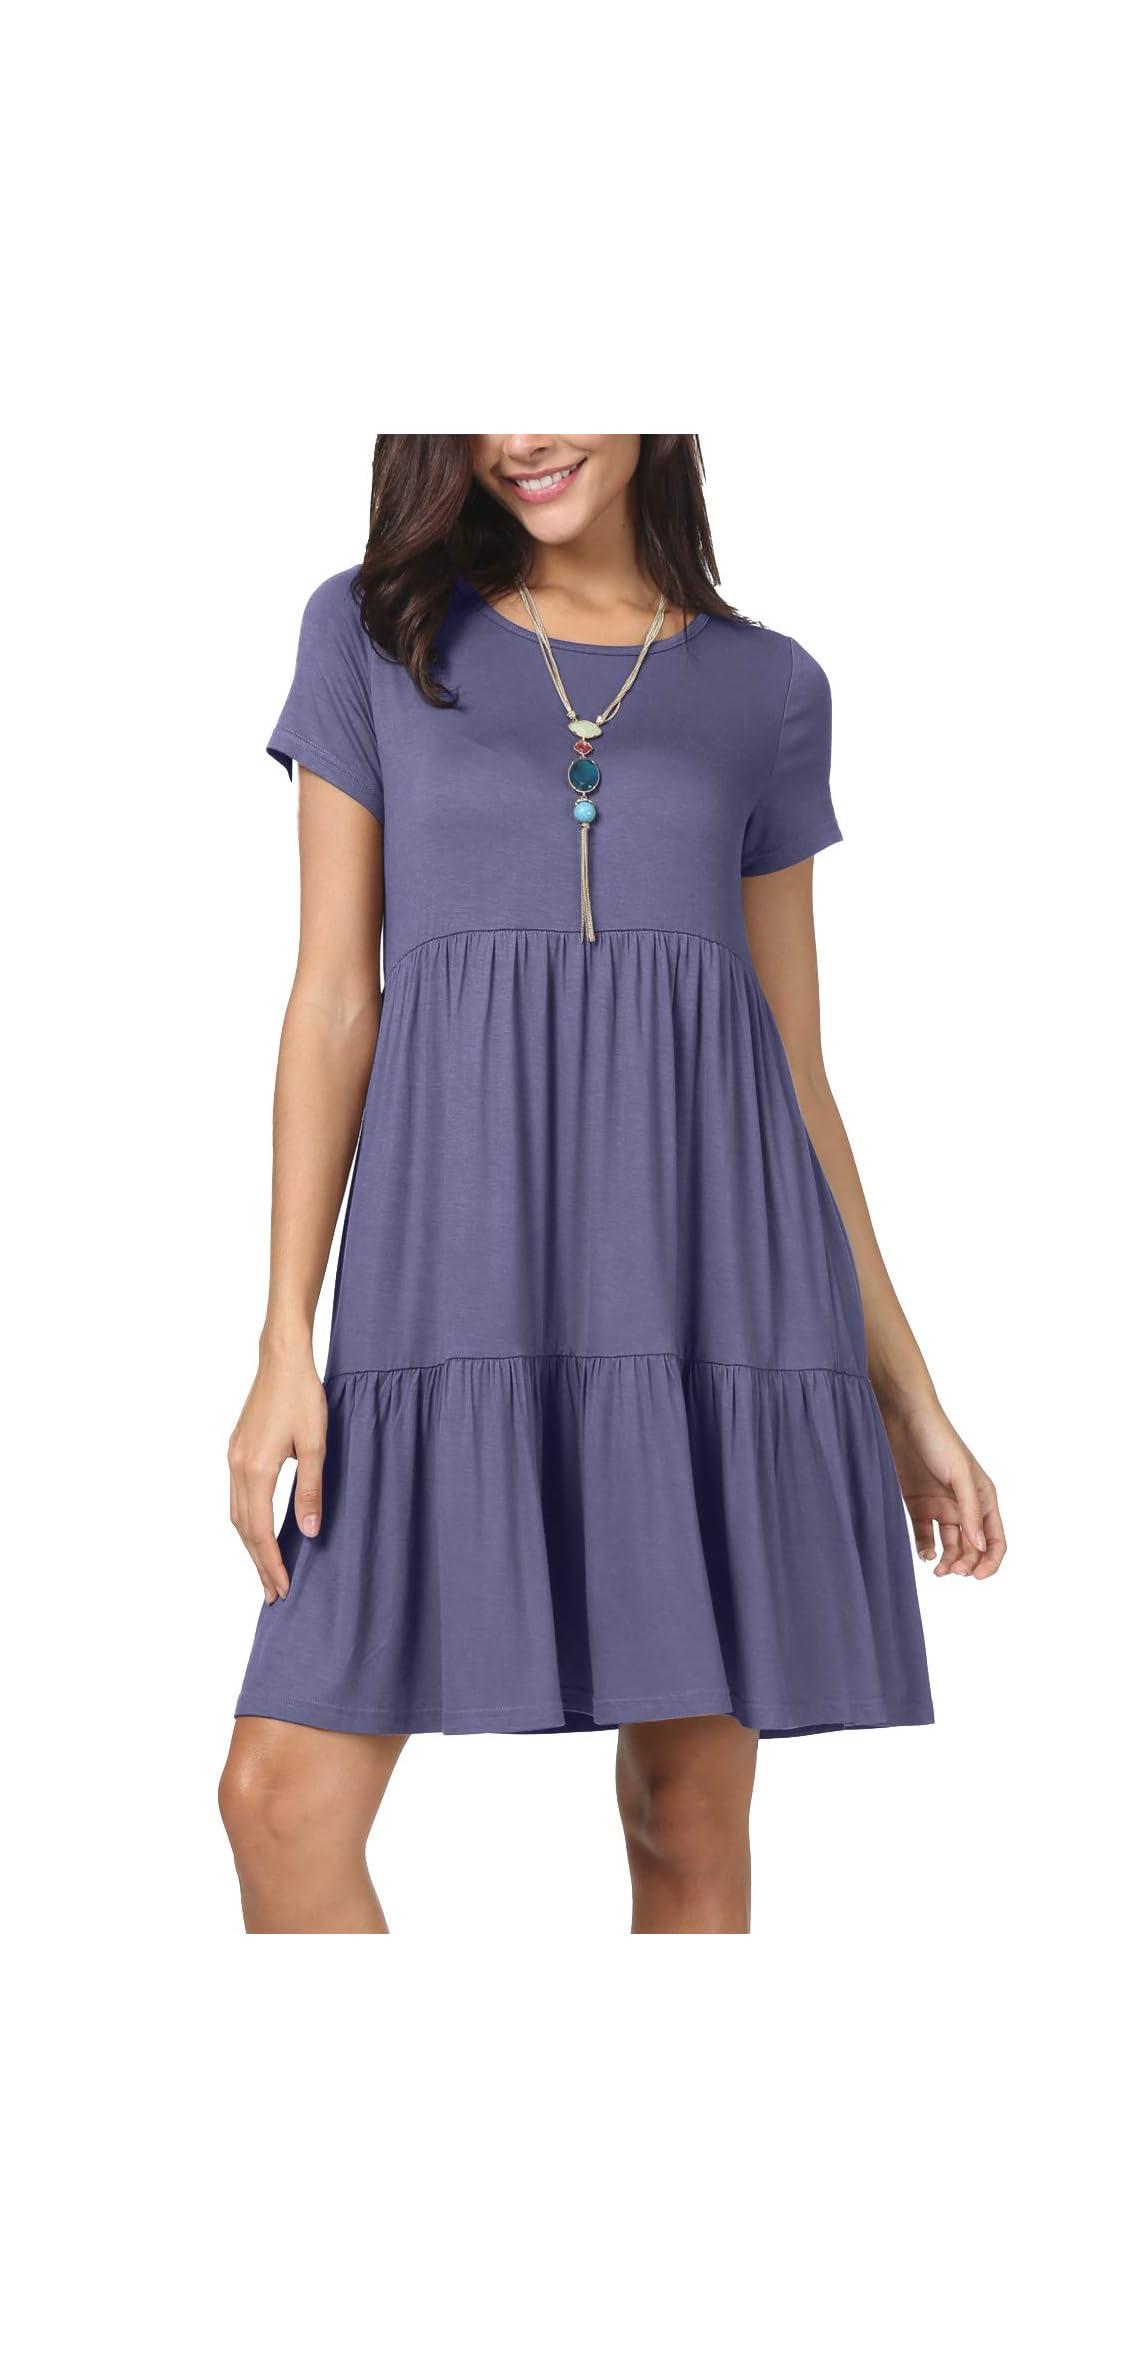 Women Summer Short Sleeve Ruffle Loose Swing Casual T